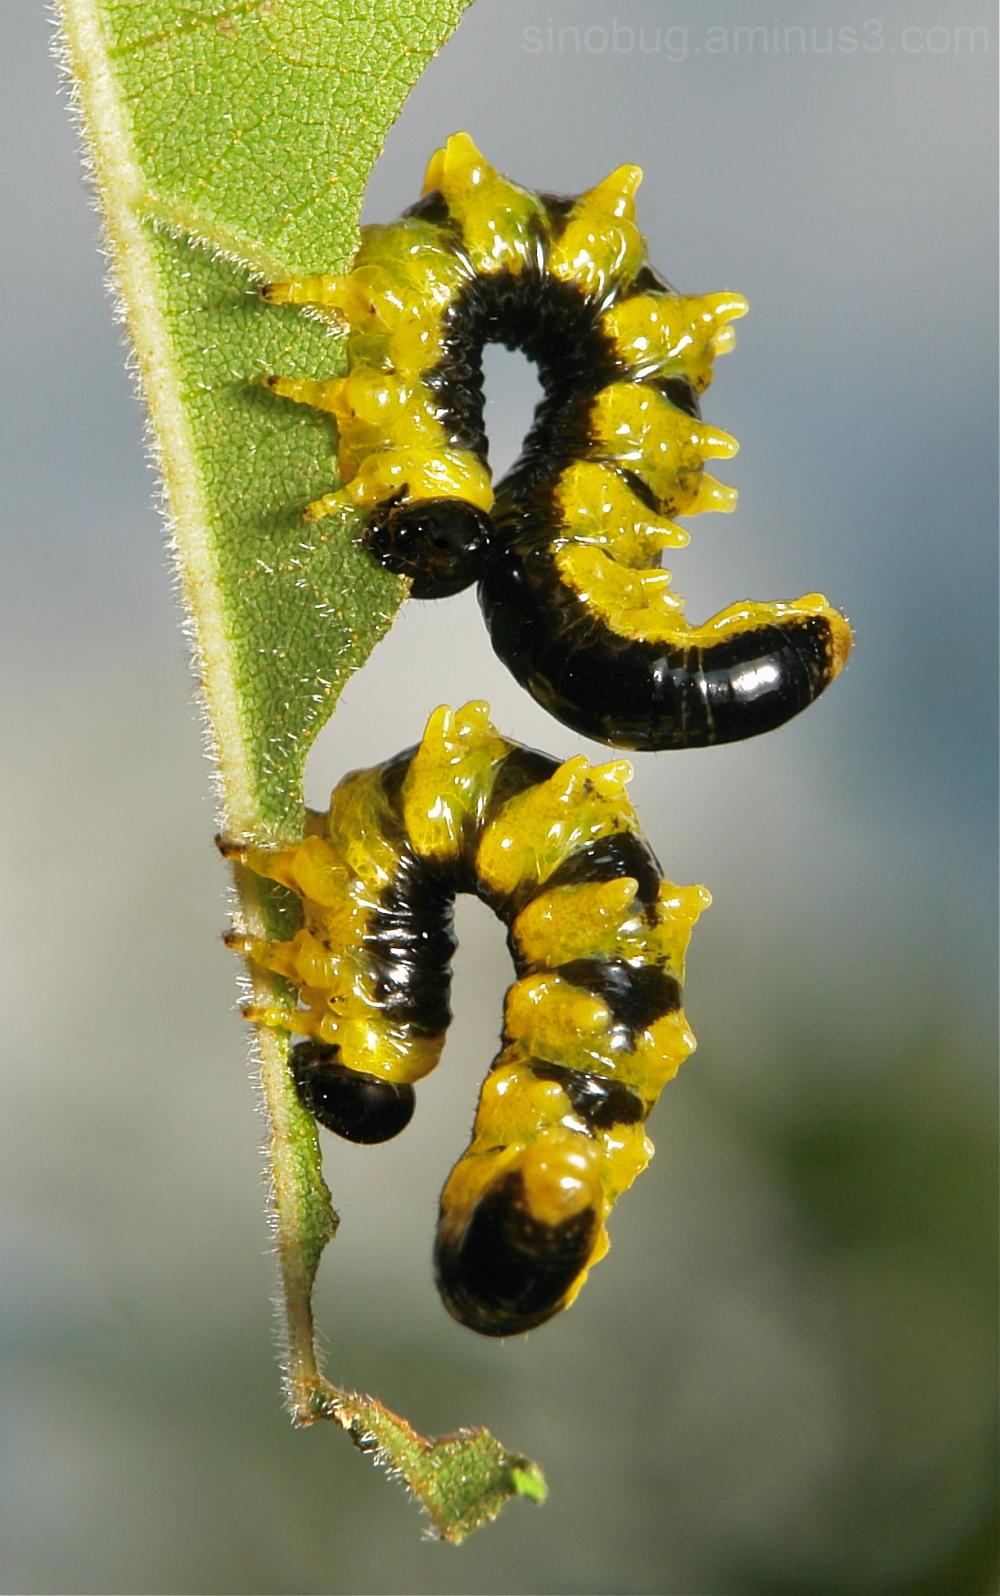 Sawfly Larvae Hymenoptera China